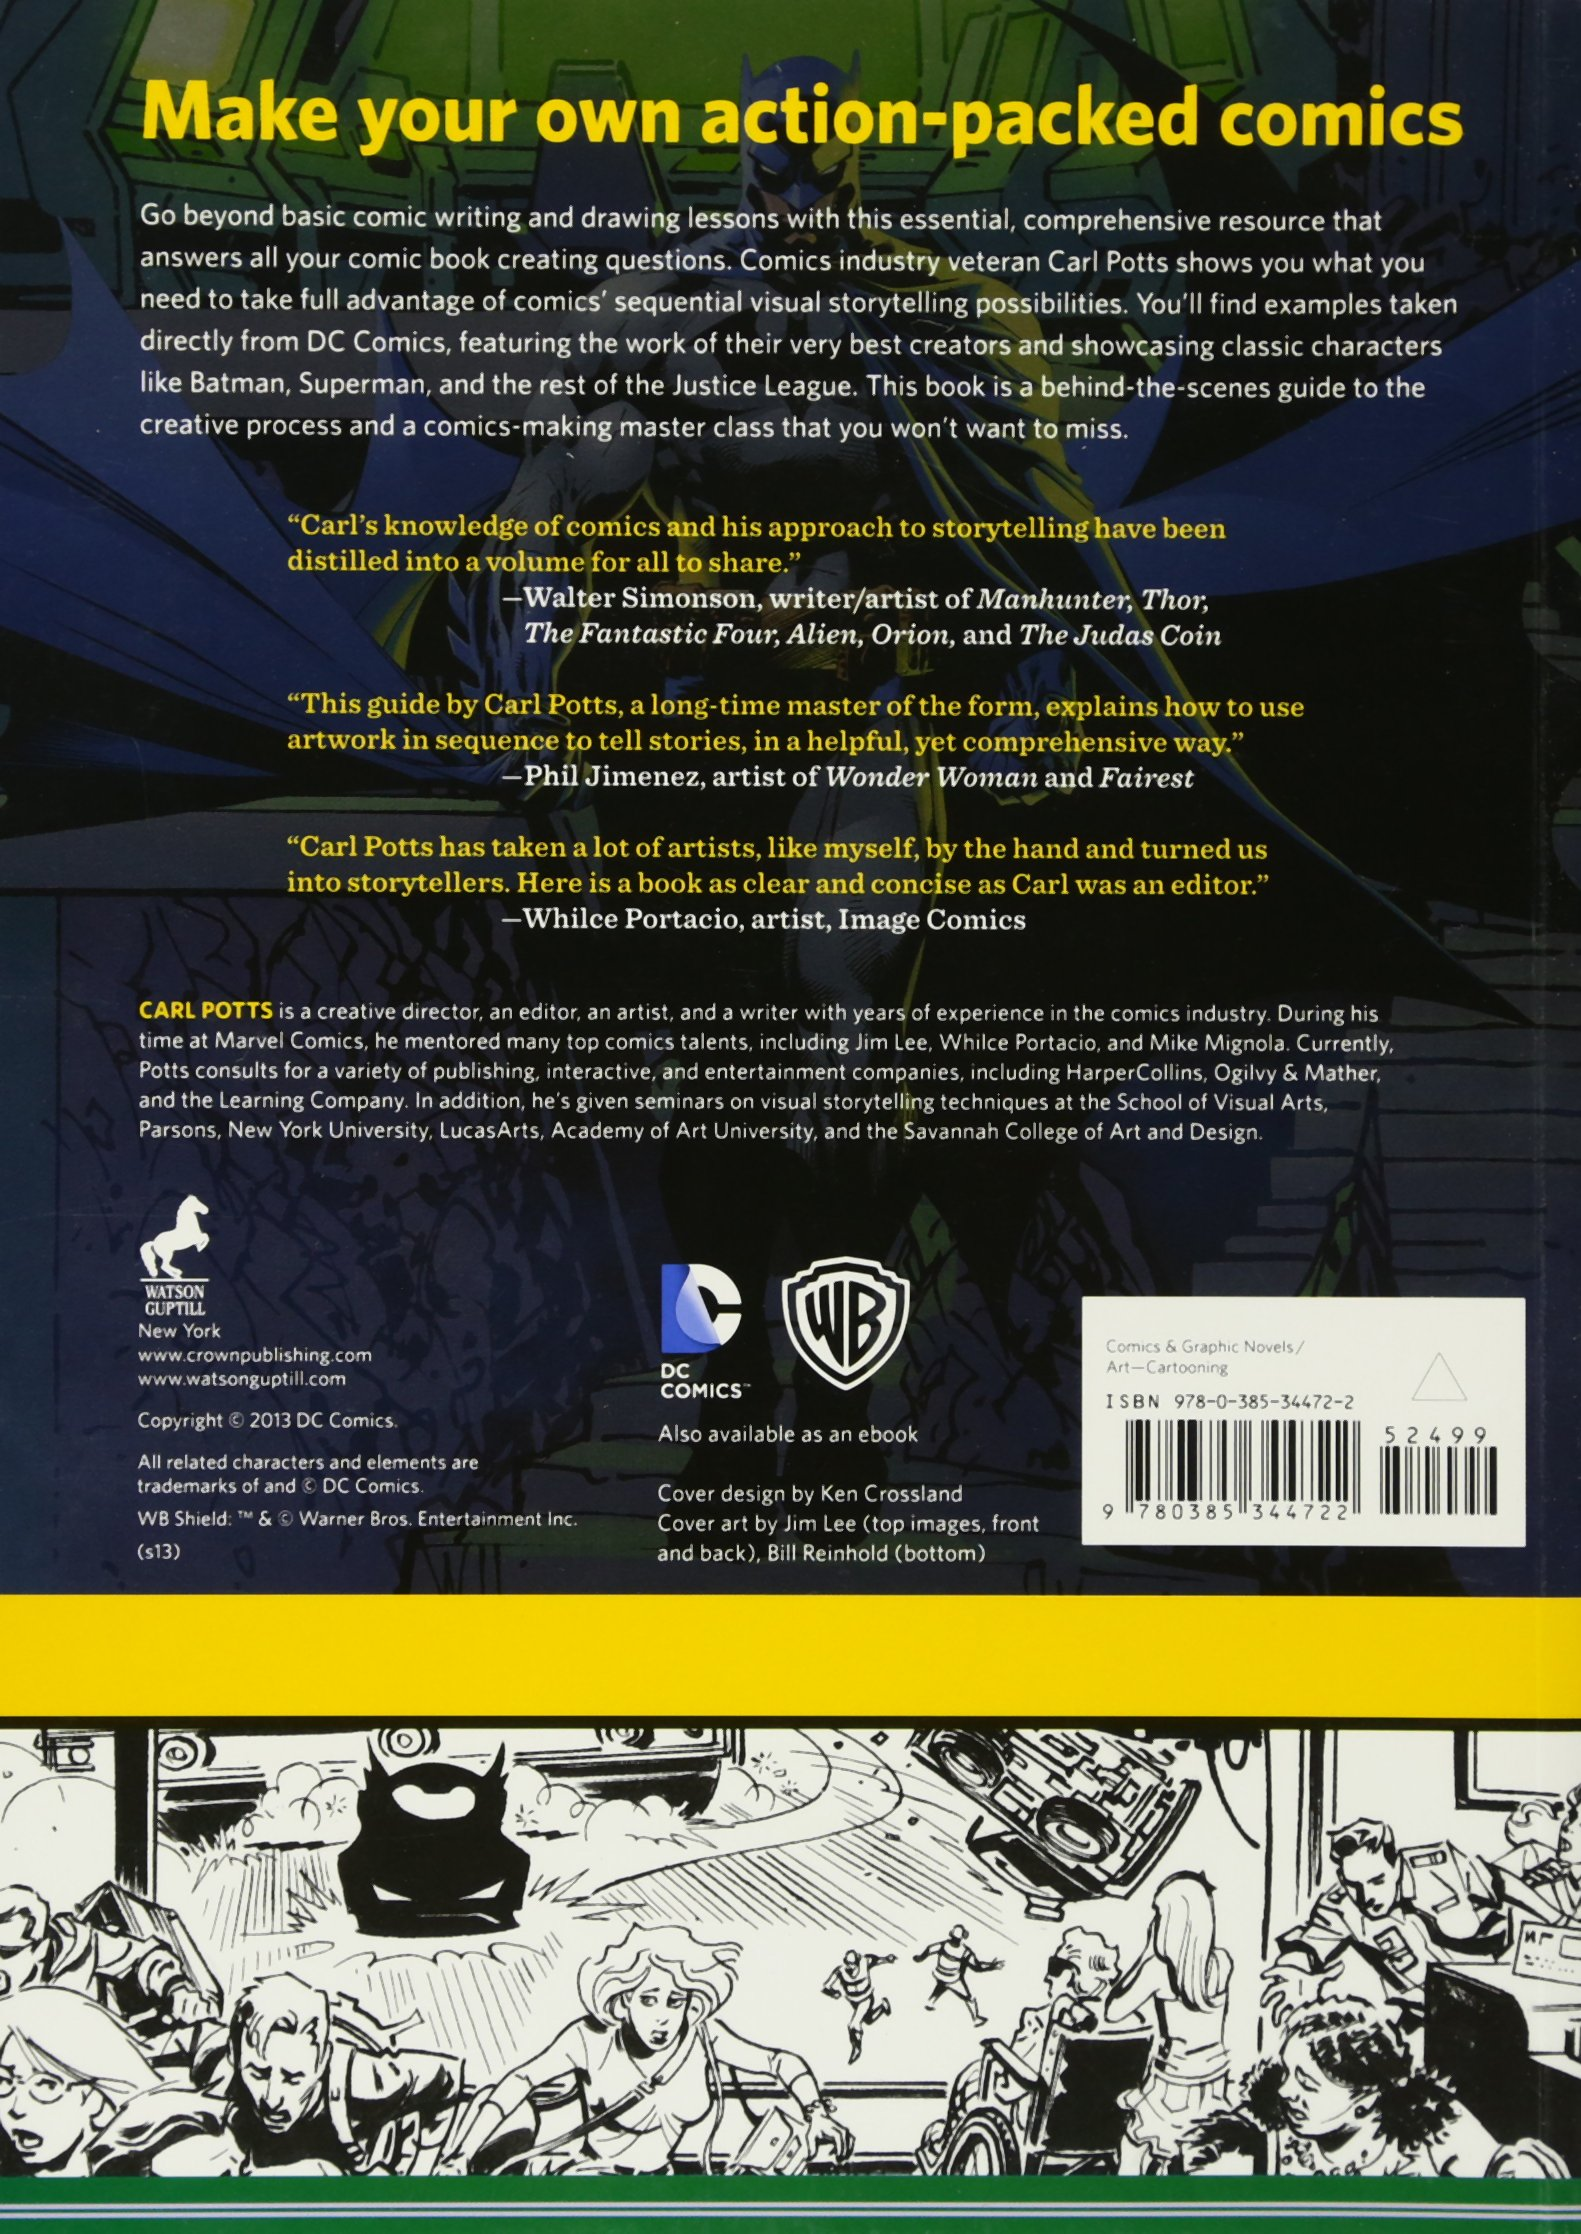 Amazon: The Dcics Guide To Creatingics: Inside The Art Of  Visual Storytelling (9780385344722): Carl Potts, Jim Lee: Books